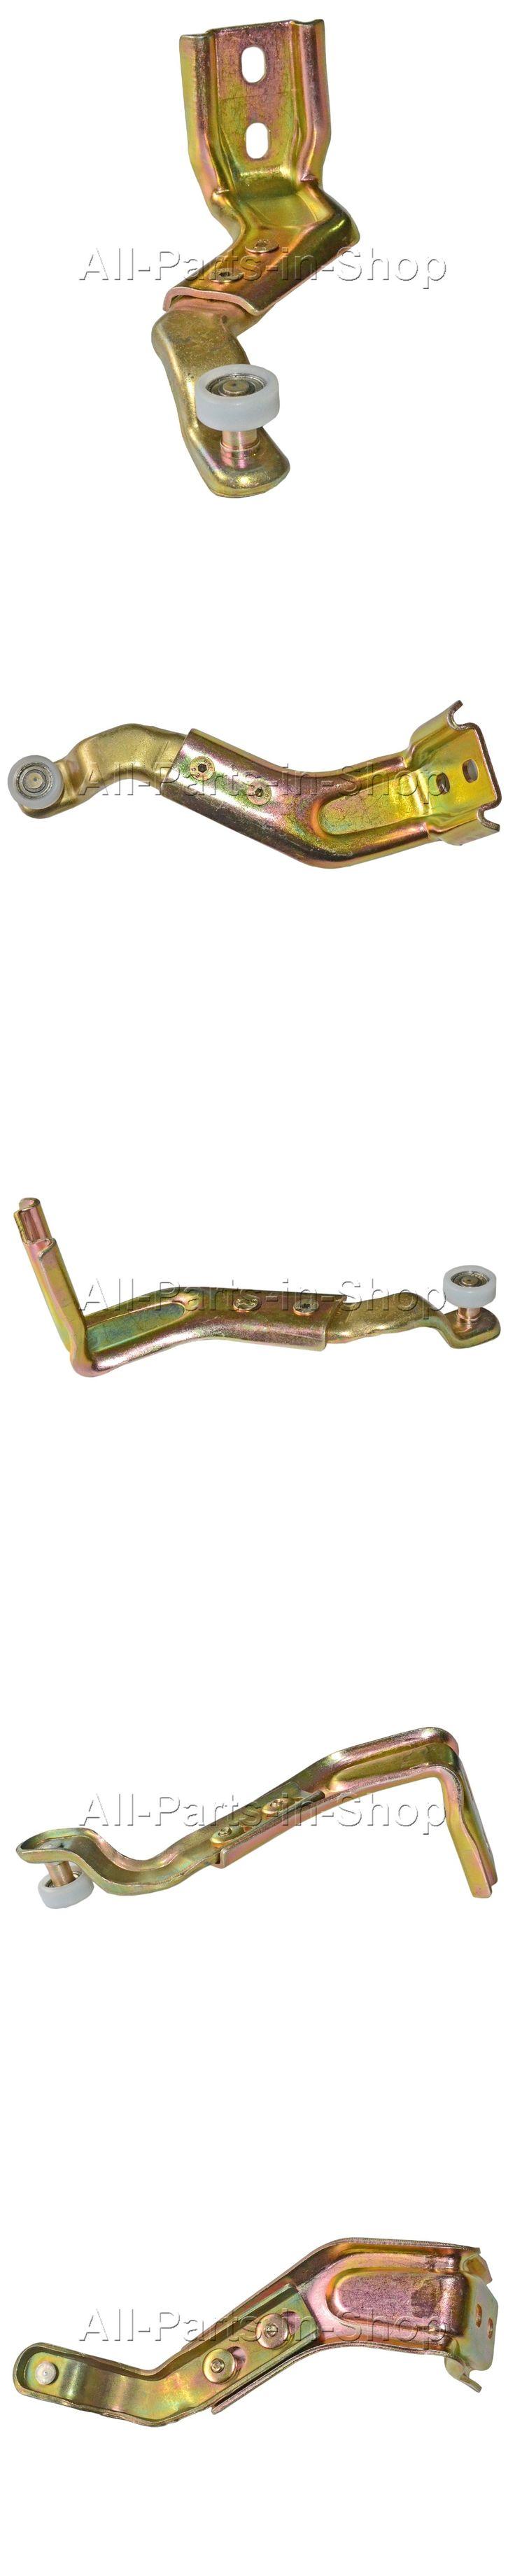 NEW Sliding Door Roller lower 9017600128 FOR Mercedes Sprinter VW LT---Right  5103588AA  2D1843398A